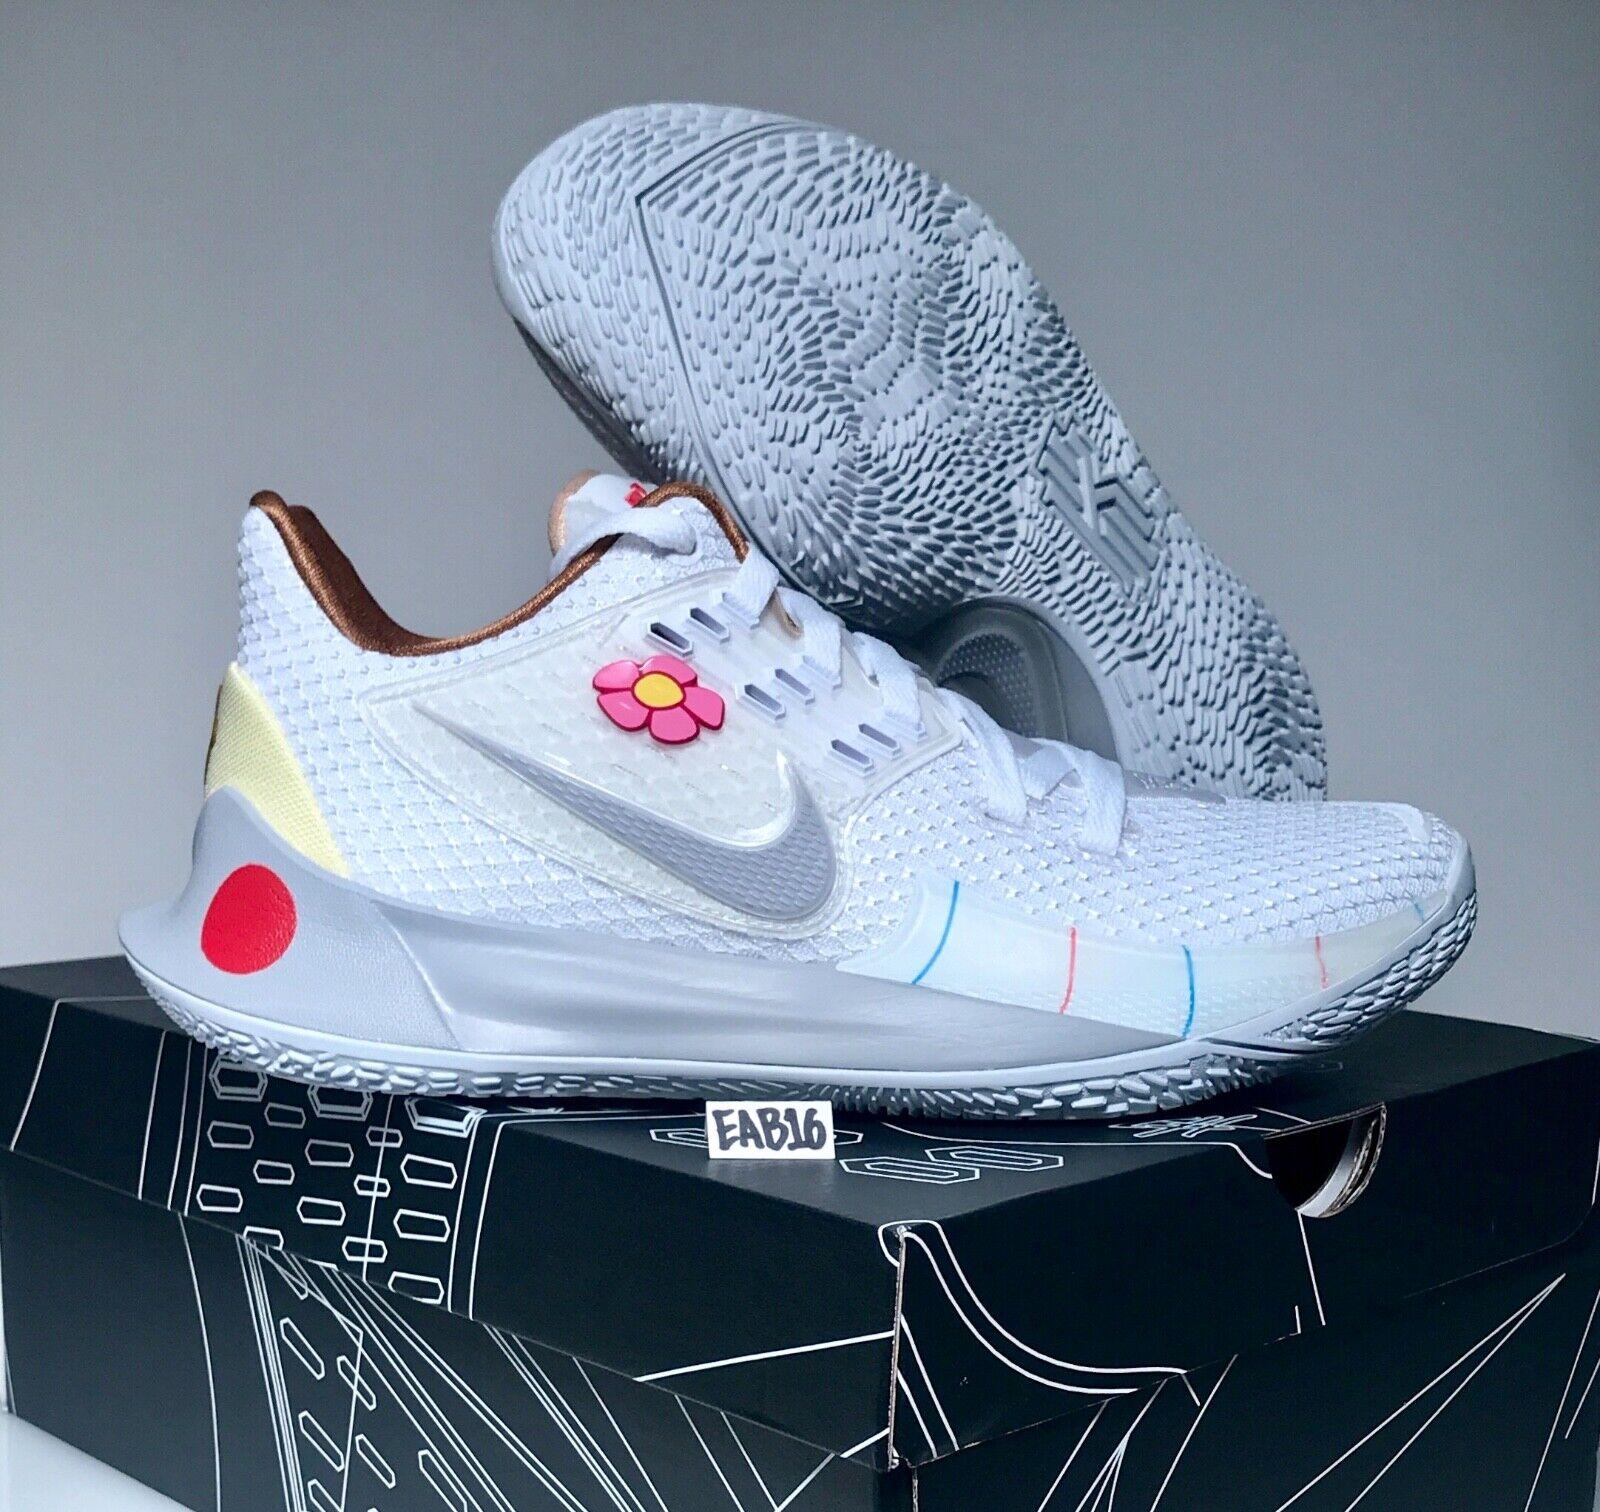 Nike Kyrie Irving Low 2 Sandy Cheeks